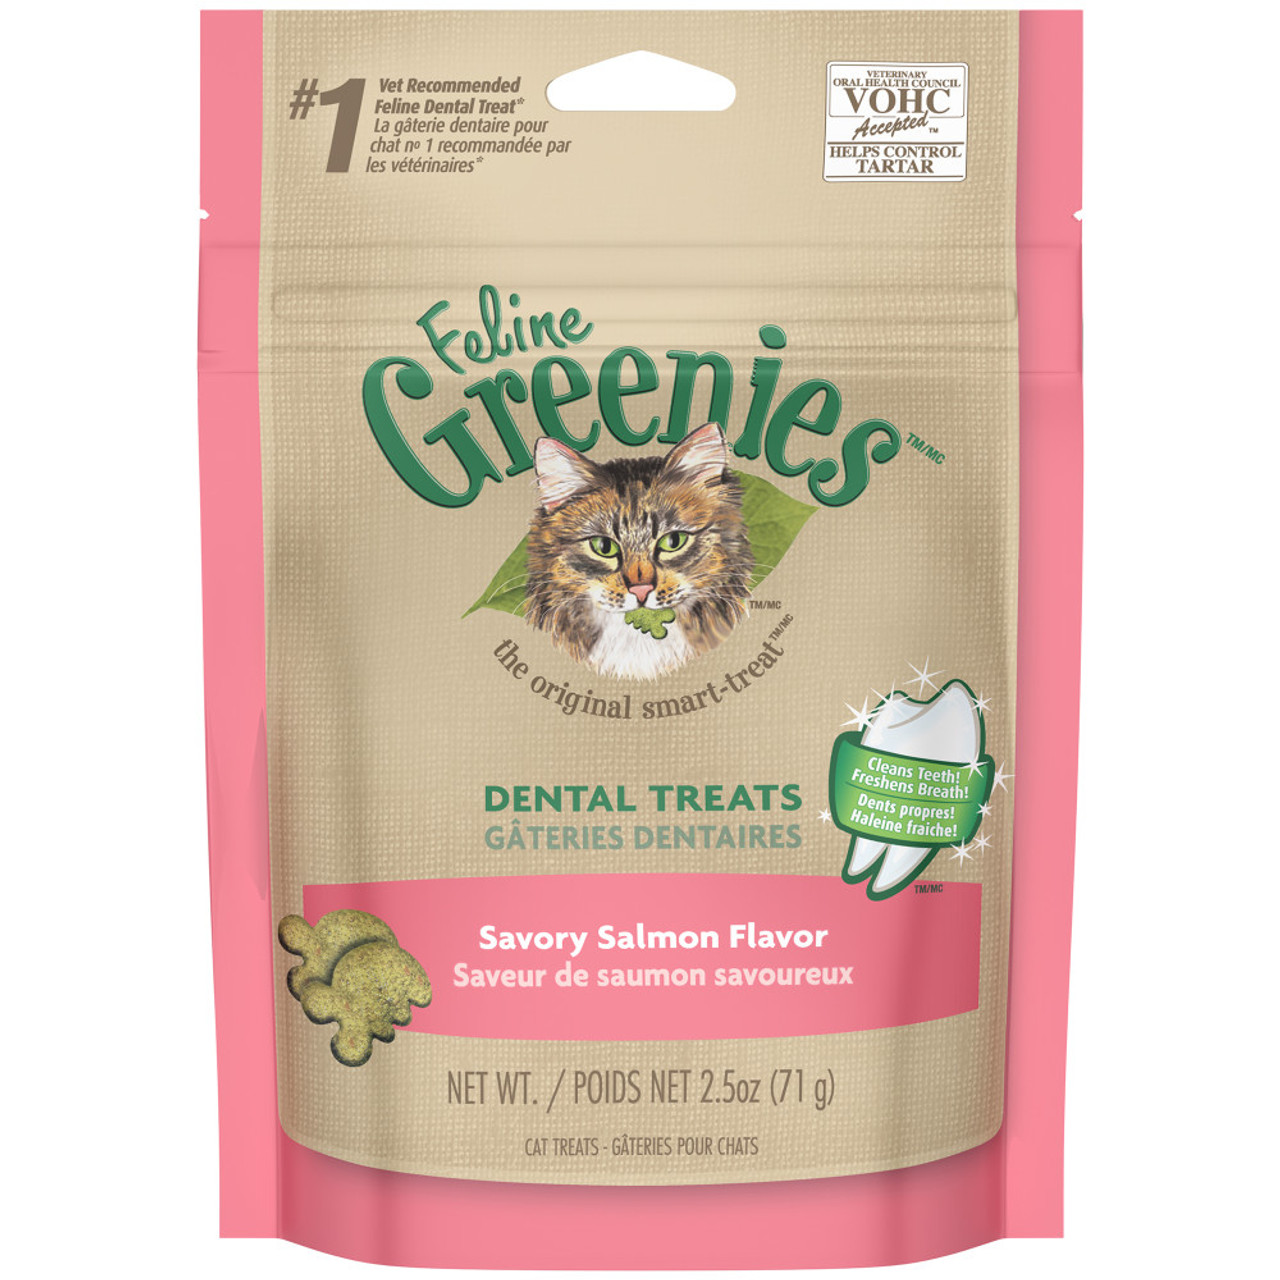 Greenies Savory Salmon Flavor Dental Cat Treats